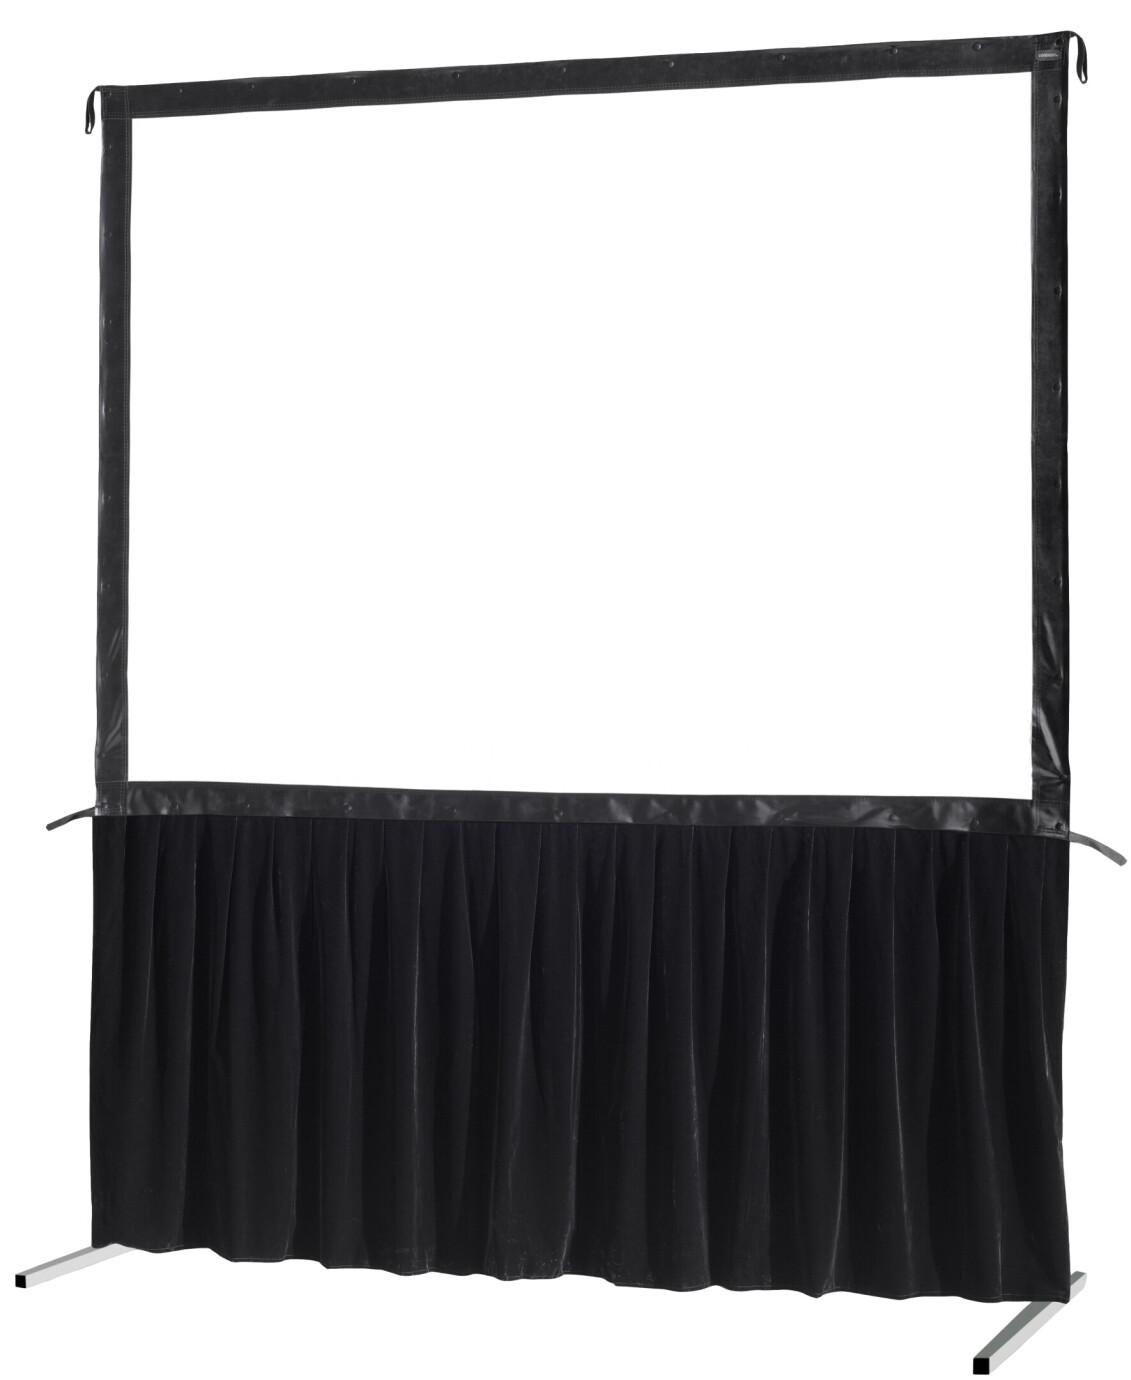 celexon Vorhangset 1-seitig für Faltrahmenleinwand Mobil Expert 203 x 152 cm